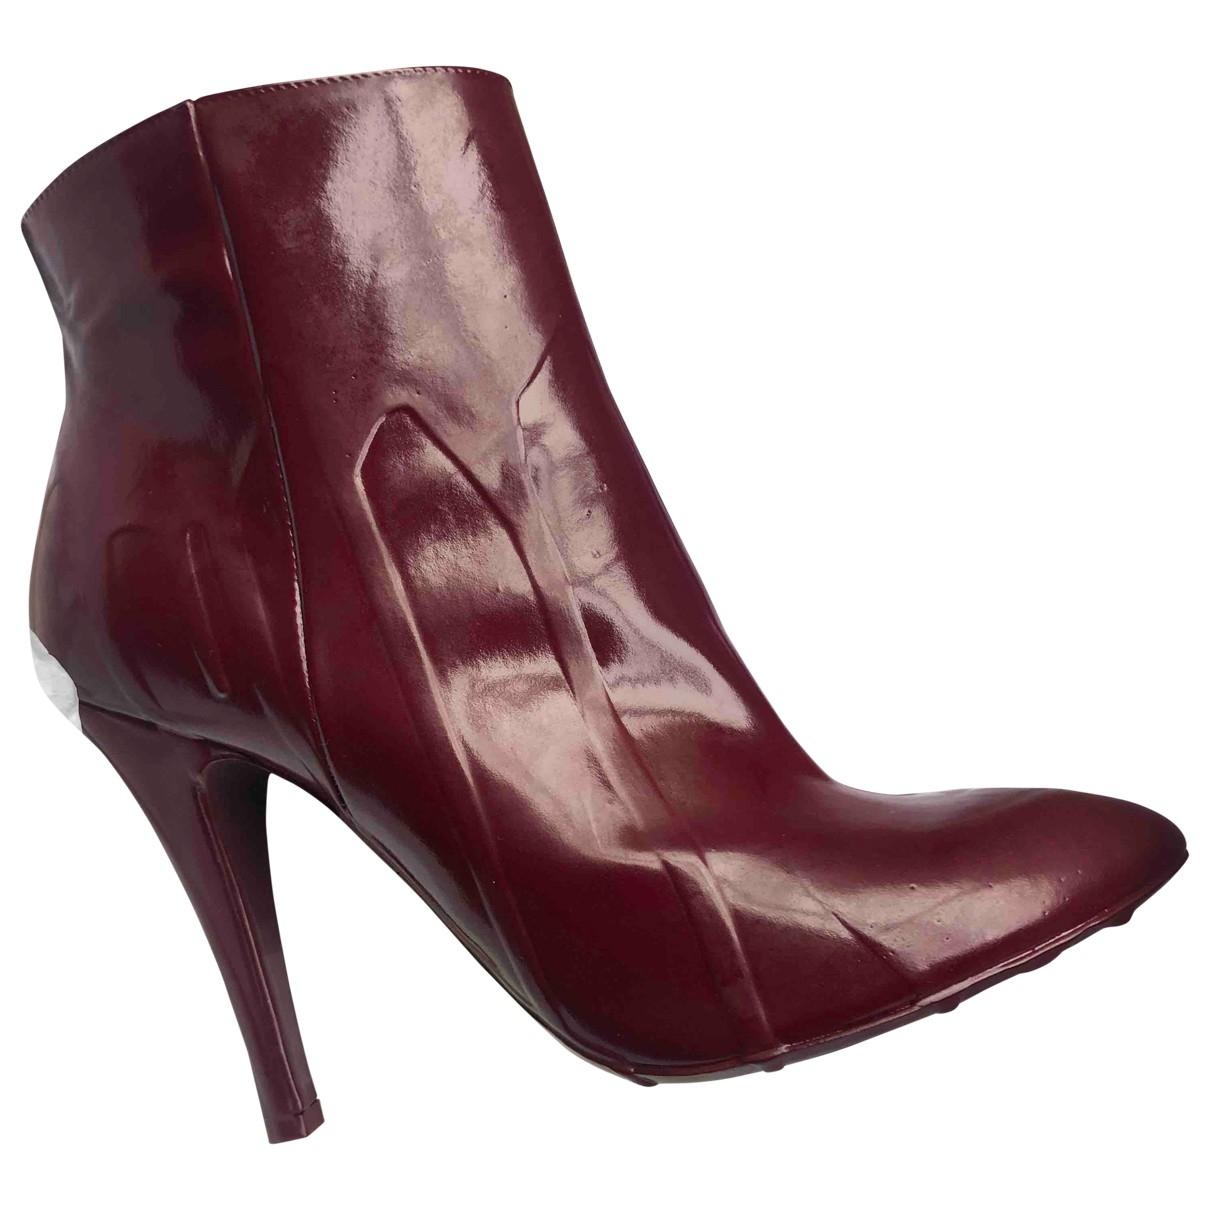 Maison Martin Margiela \N Burgundy Leather Ankle boots for Women 37 EU